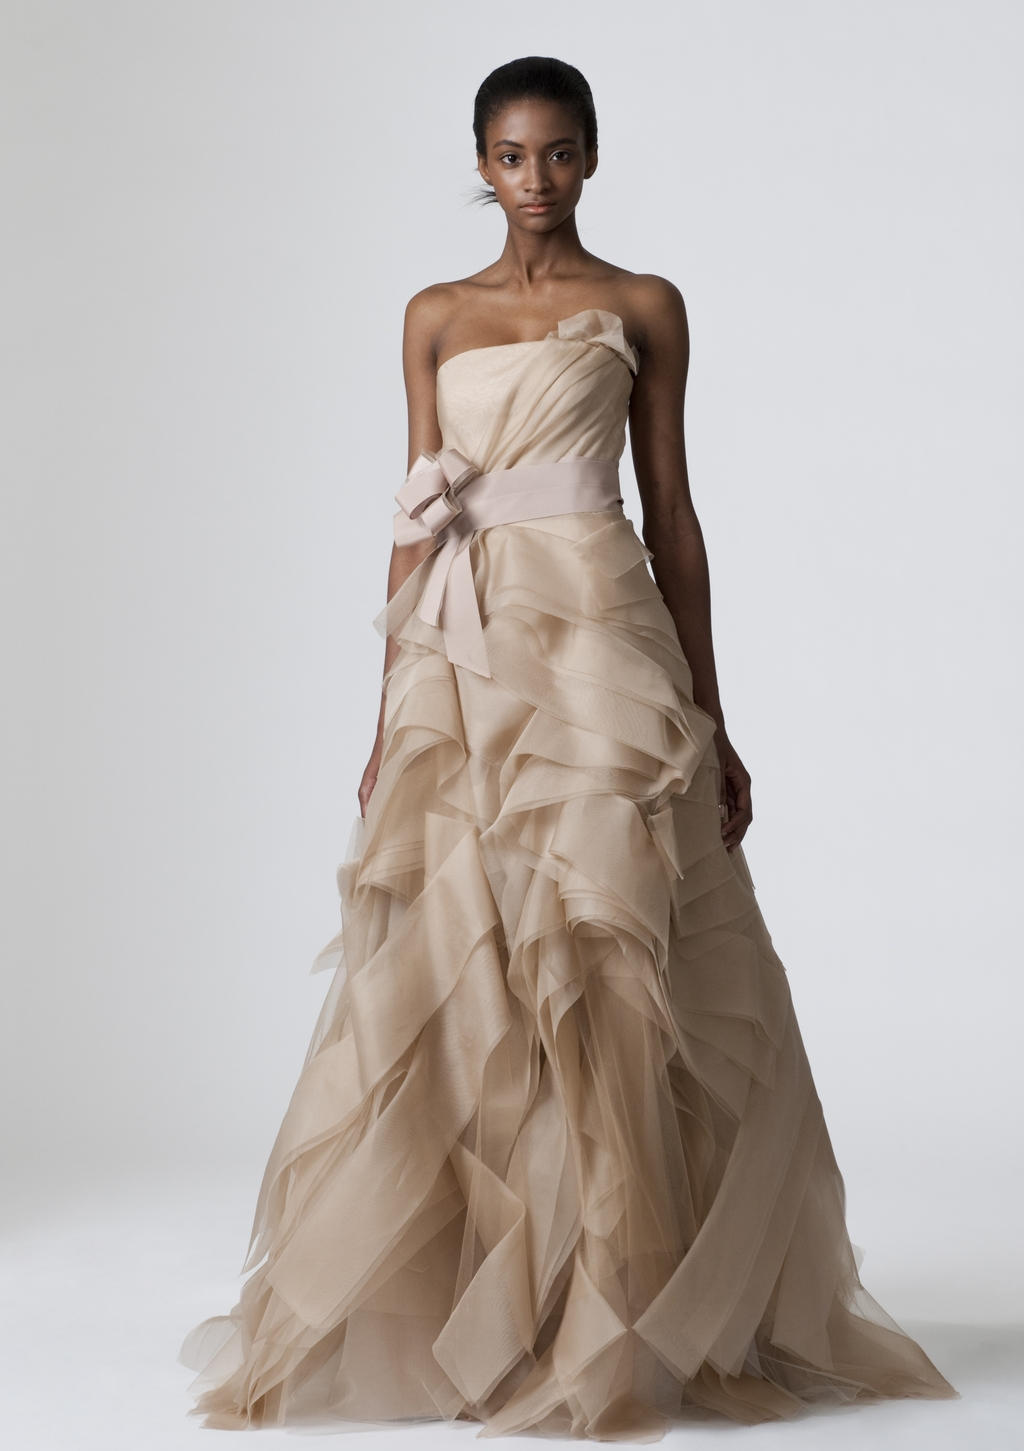 Vera-wang-wedding-dresses-spring-2010-6.full